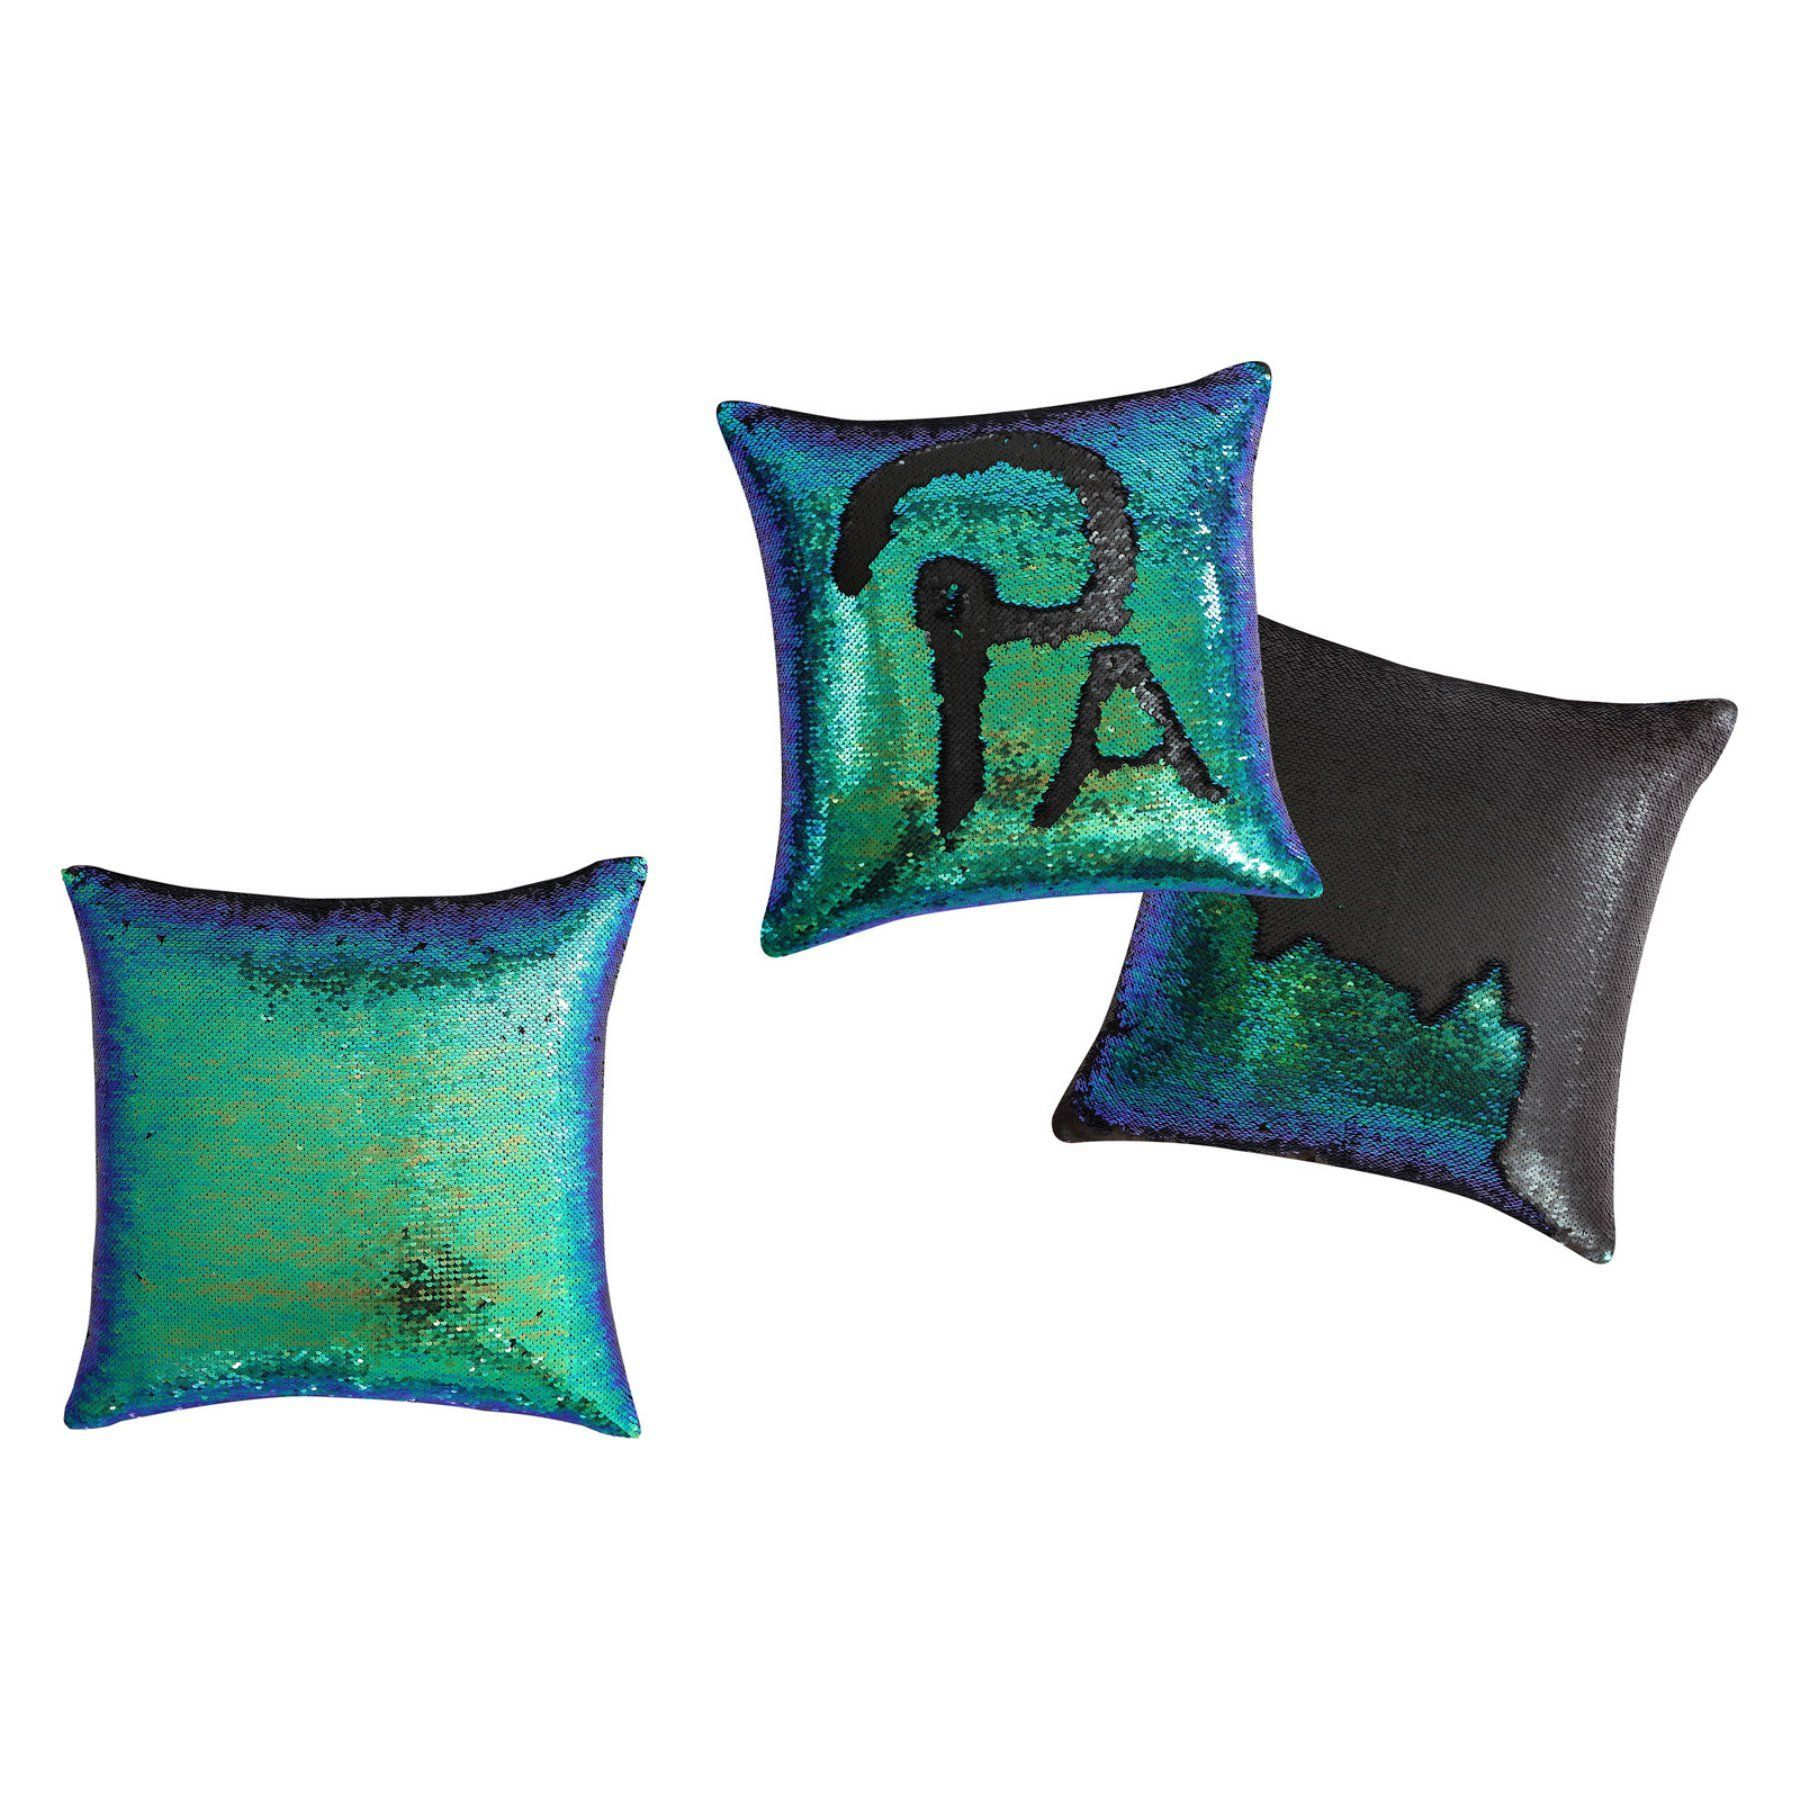 VCNY Adella Sequin Mermaid 16 in. Throw Pillow - A3L-PLW-1616-I2-AQ